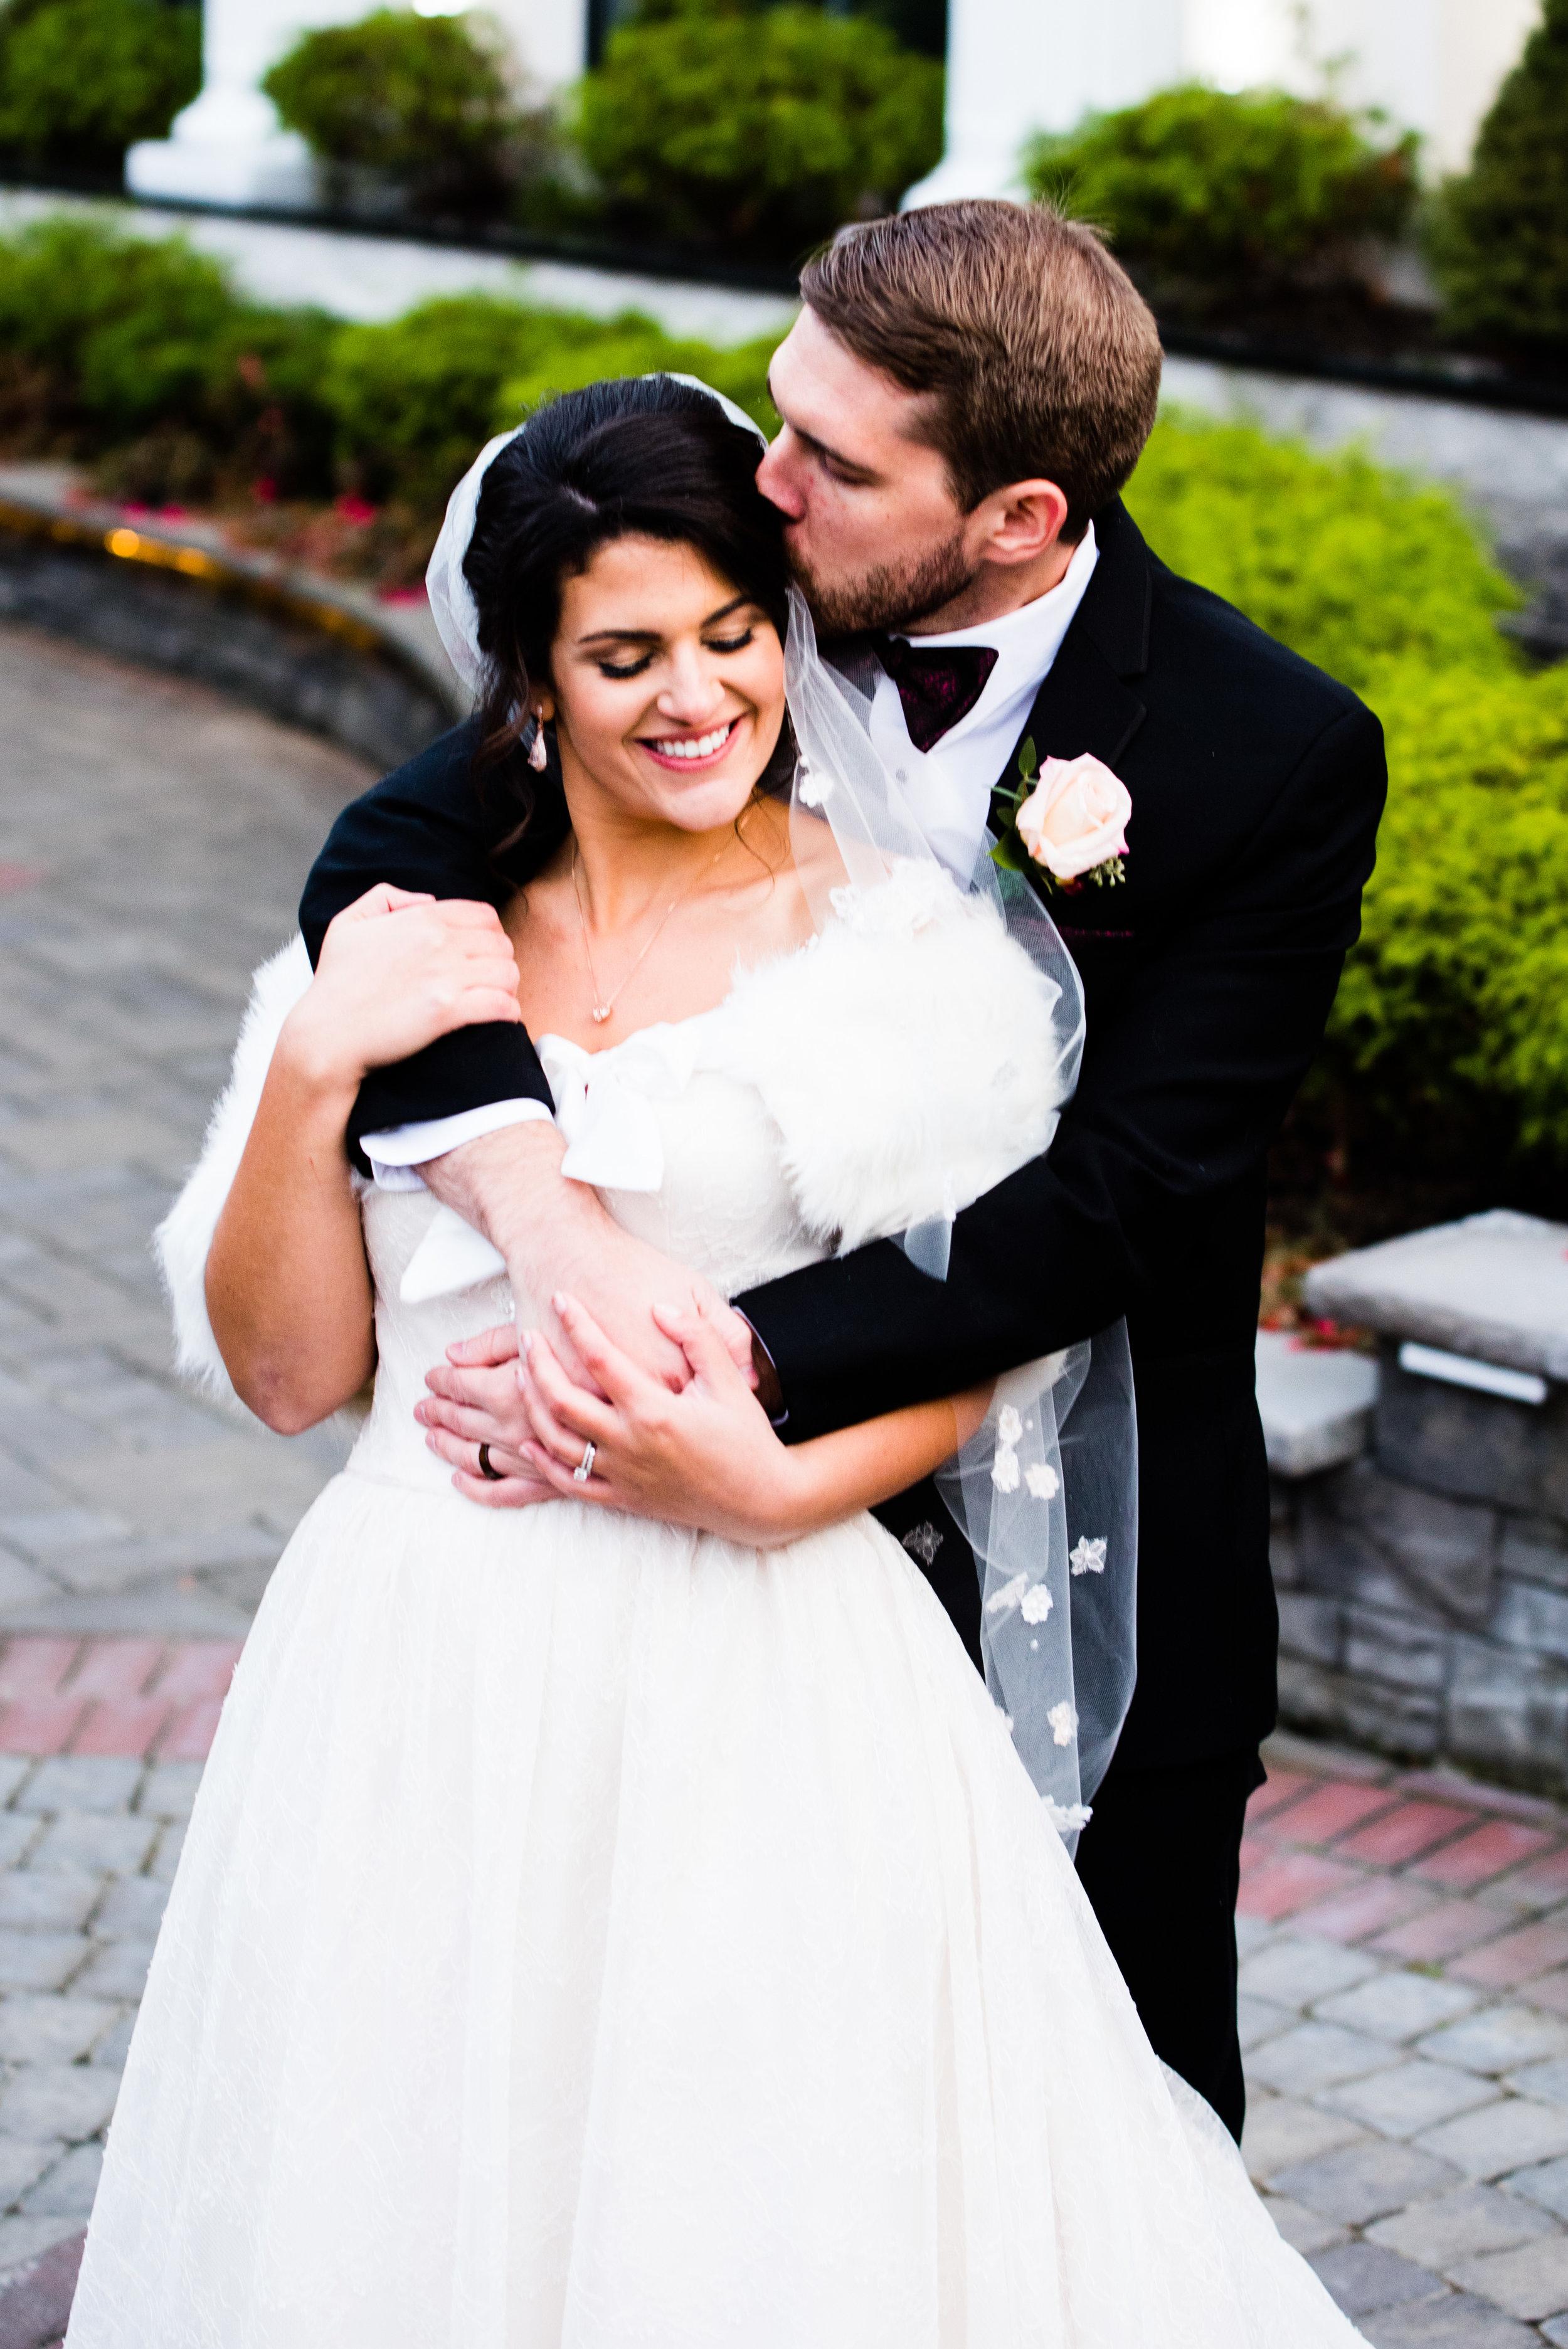 Luciens Manor Wedding Photos - 073.jpg